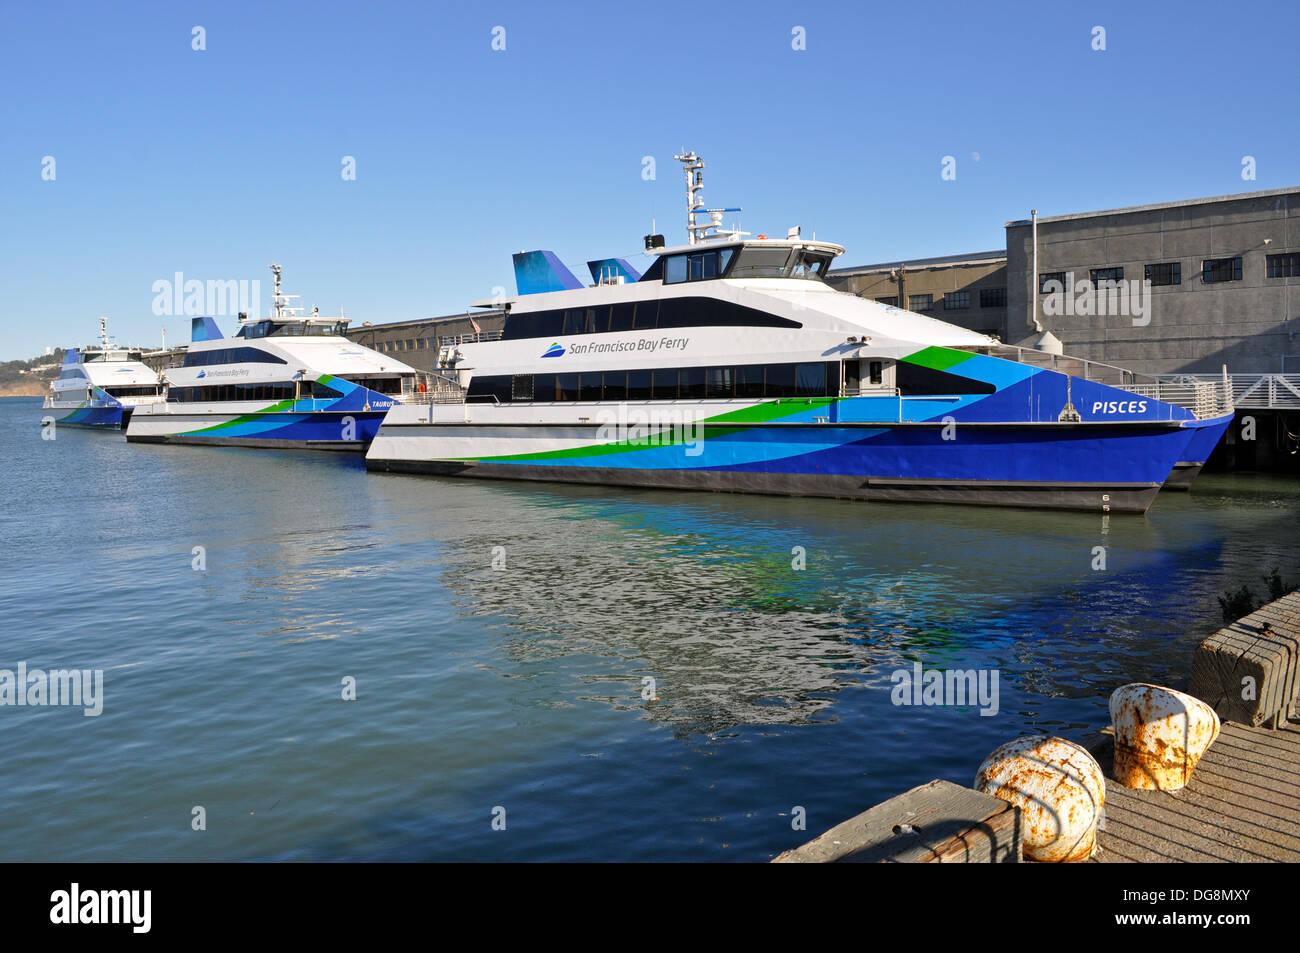 San Francisco Bay ferry boats. - Stock Image